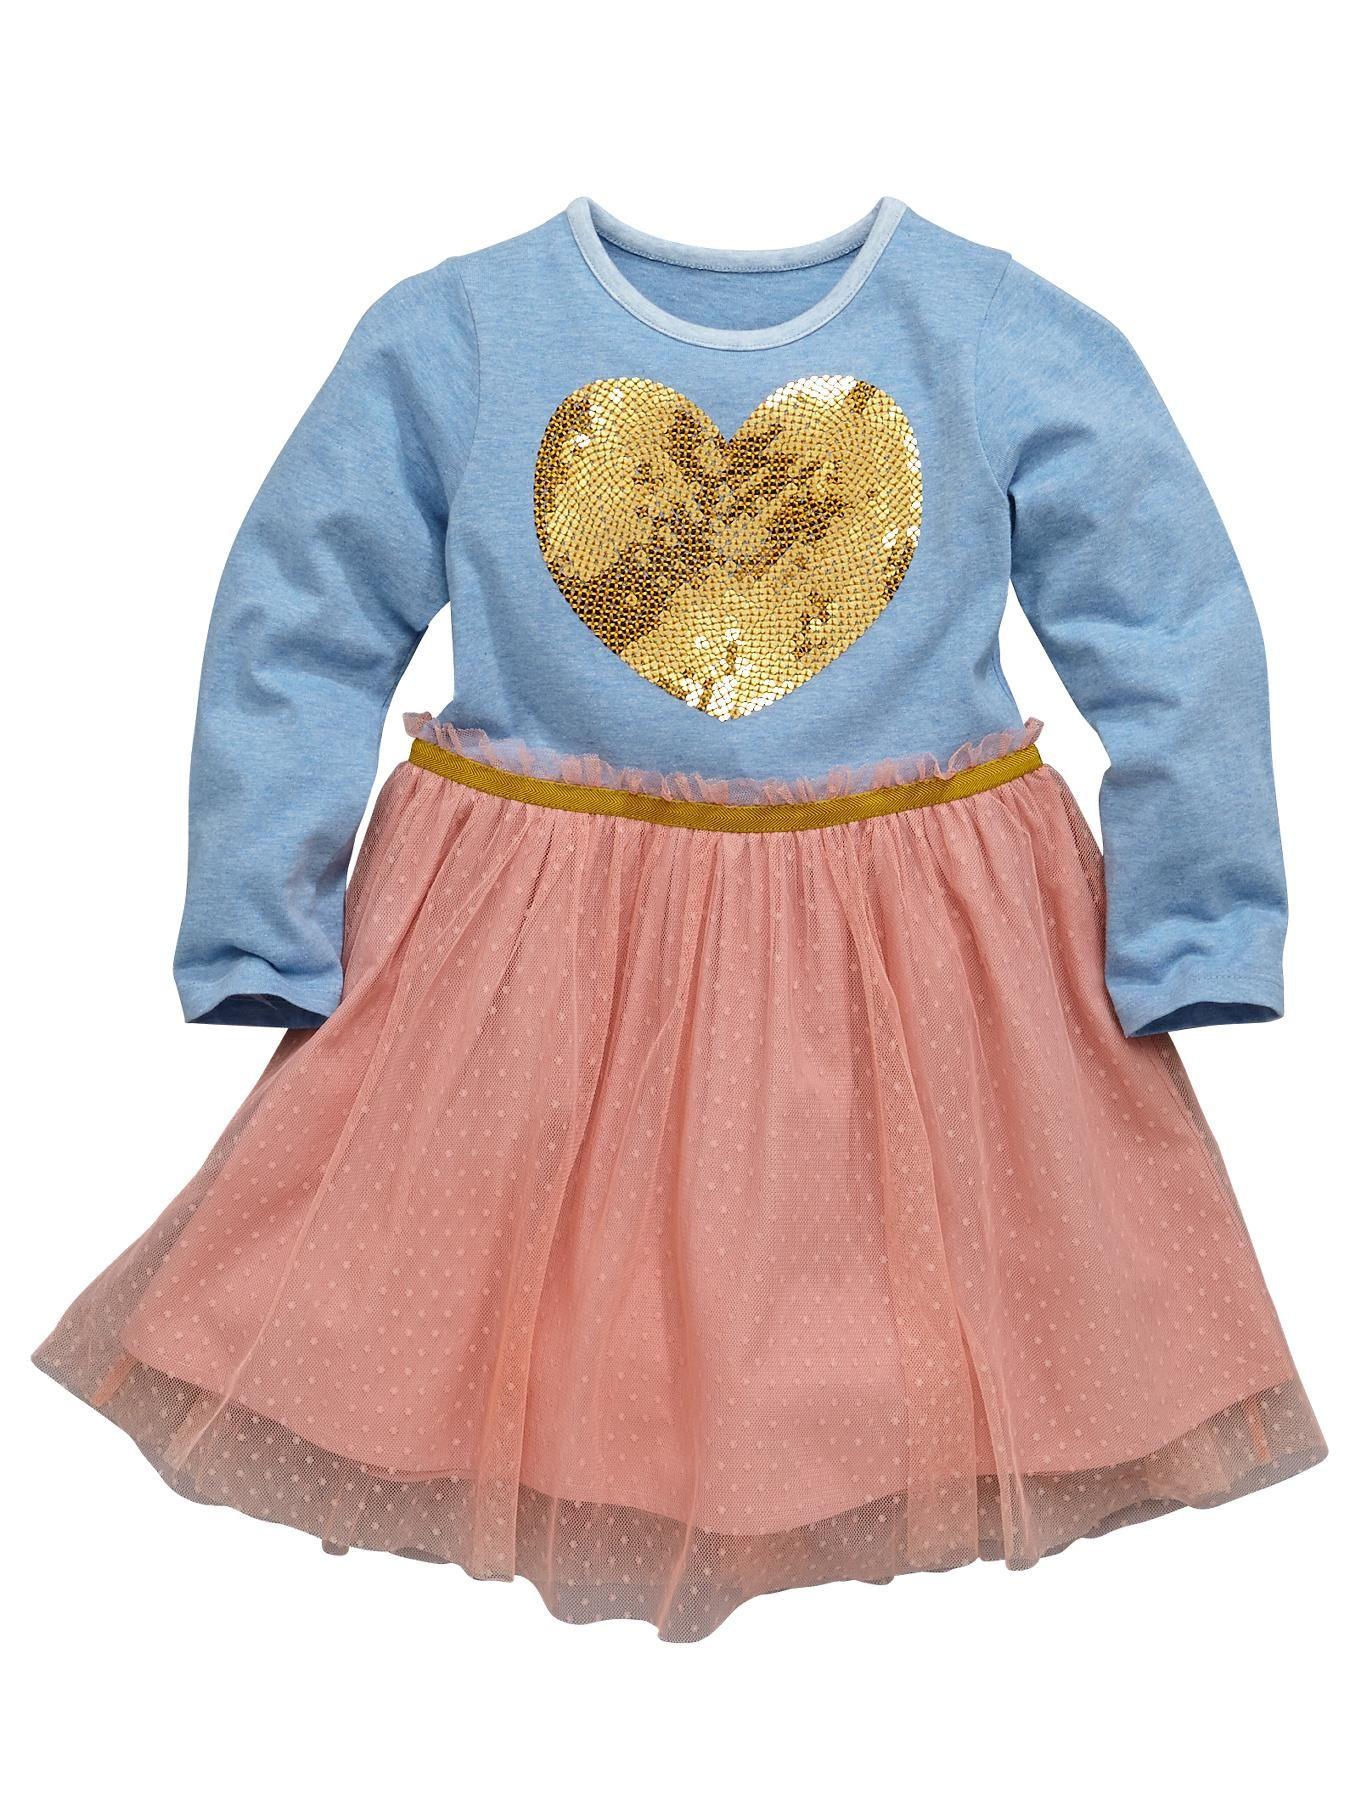 Willsa Toddler Girls Dress Printing Sleeveless Bowknot Princess Dress Tutu Dress